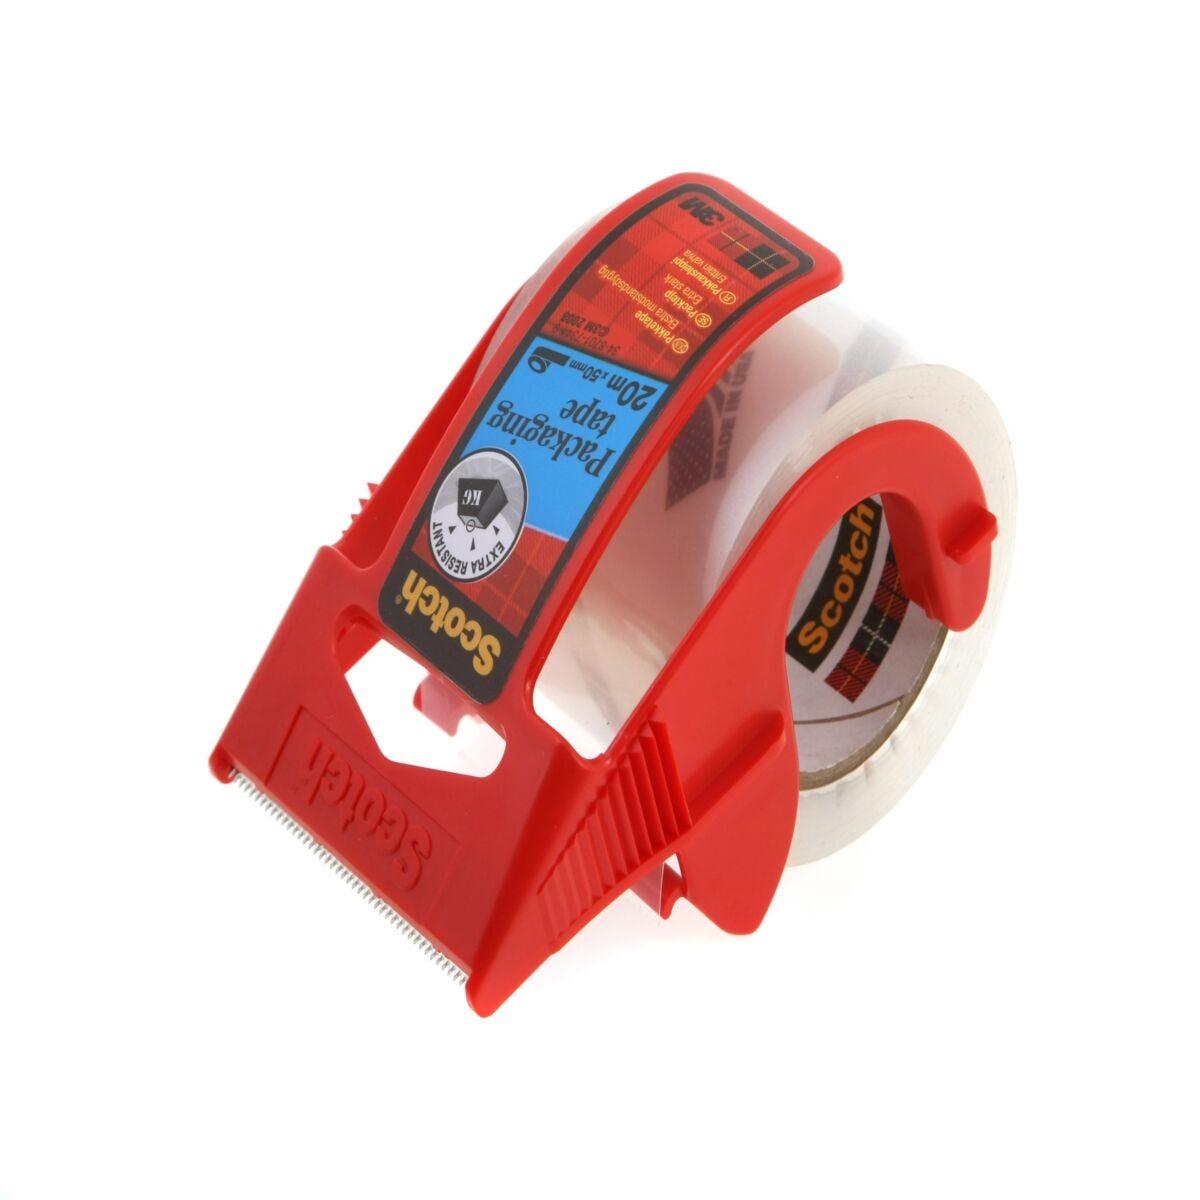 3M Scotch Mailing Tape 50mm x 20m with Dispenser